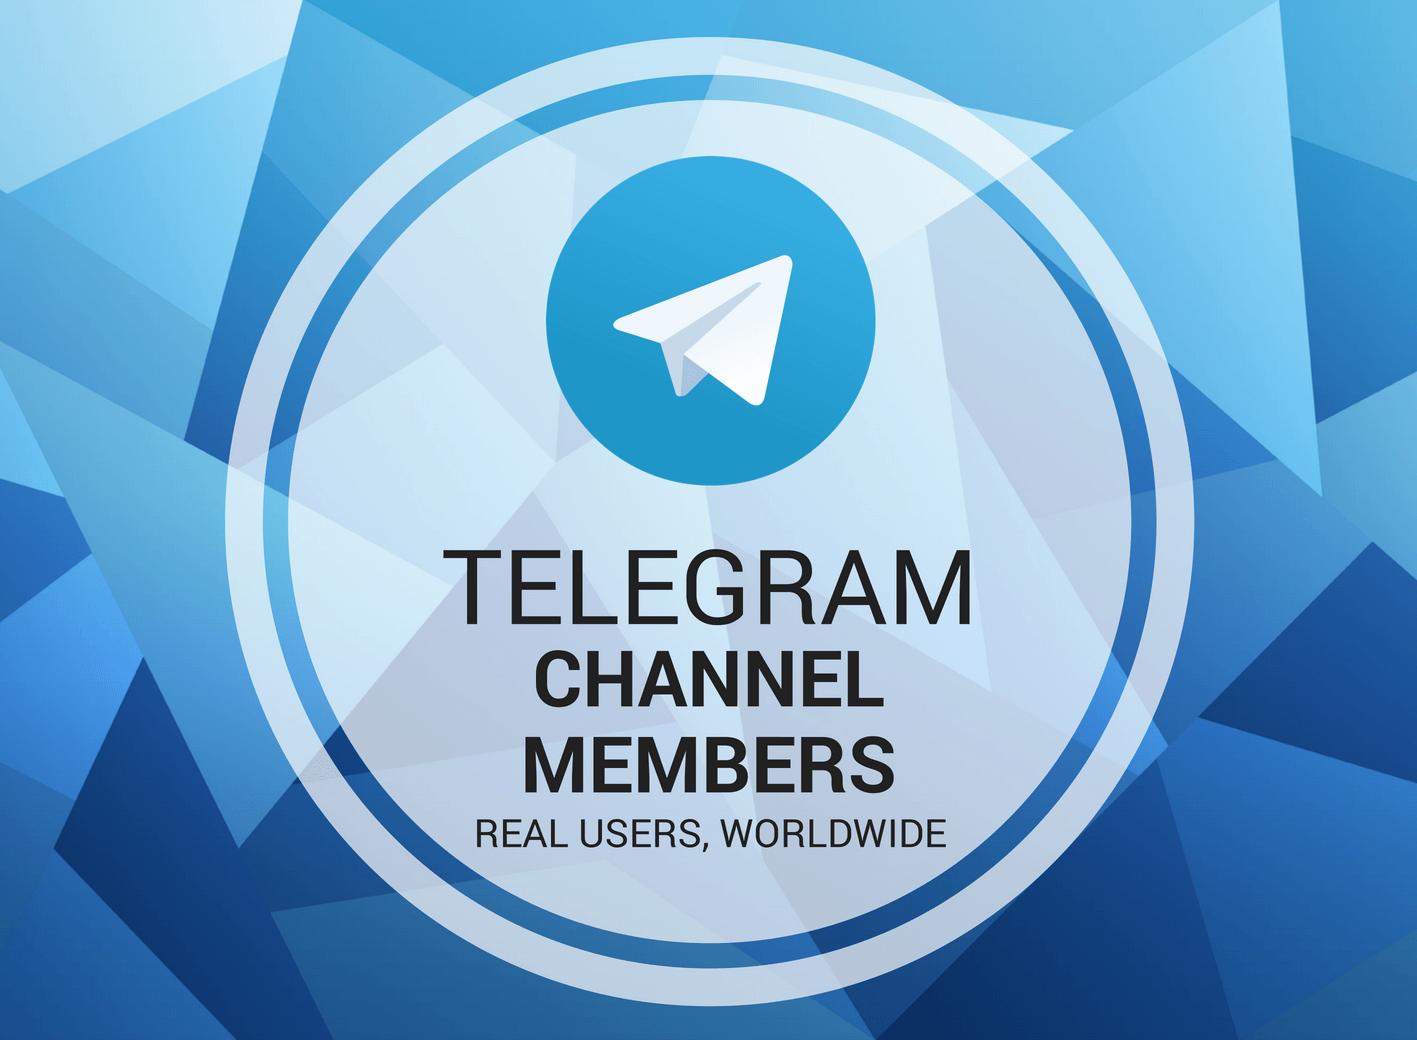 ۲۵۰۰ عضو آنلاین ۹۰ درصد ایرانی کانال تلگرام Social media